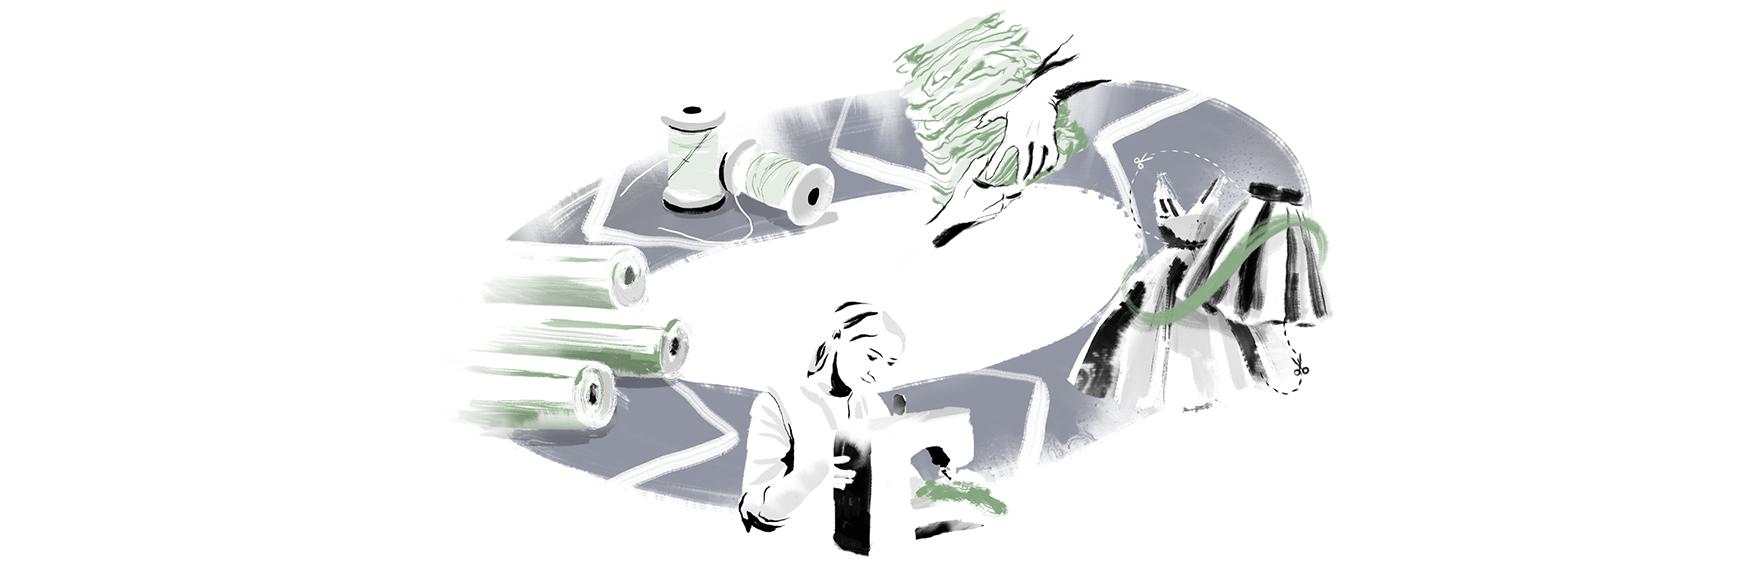 Upcycling, recyclage et régénération